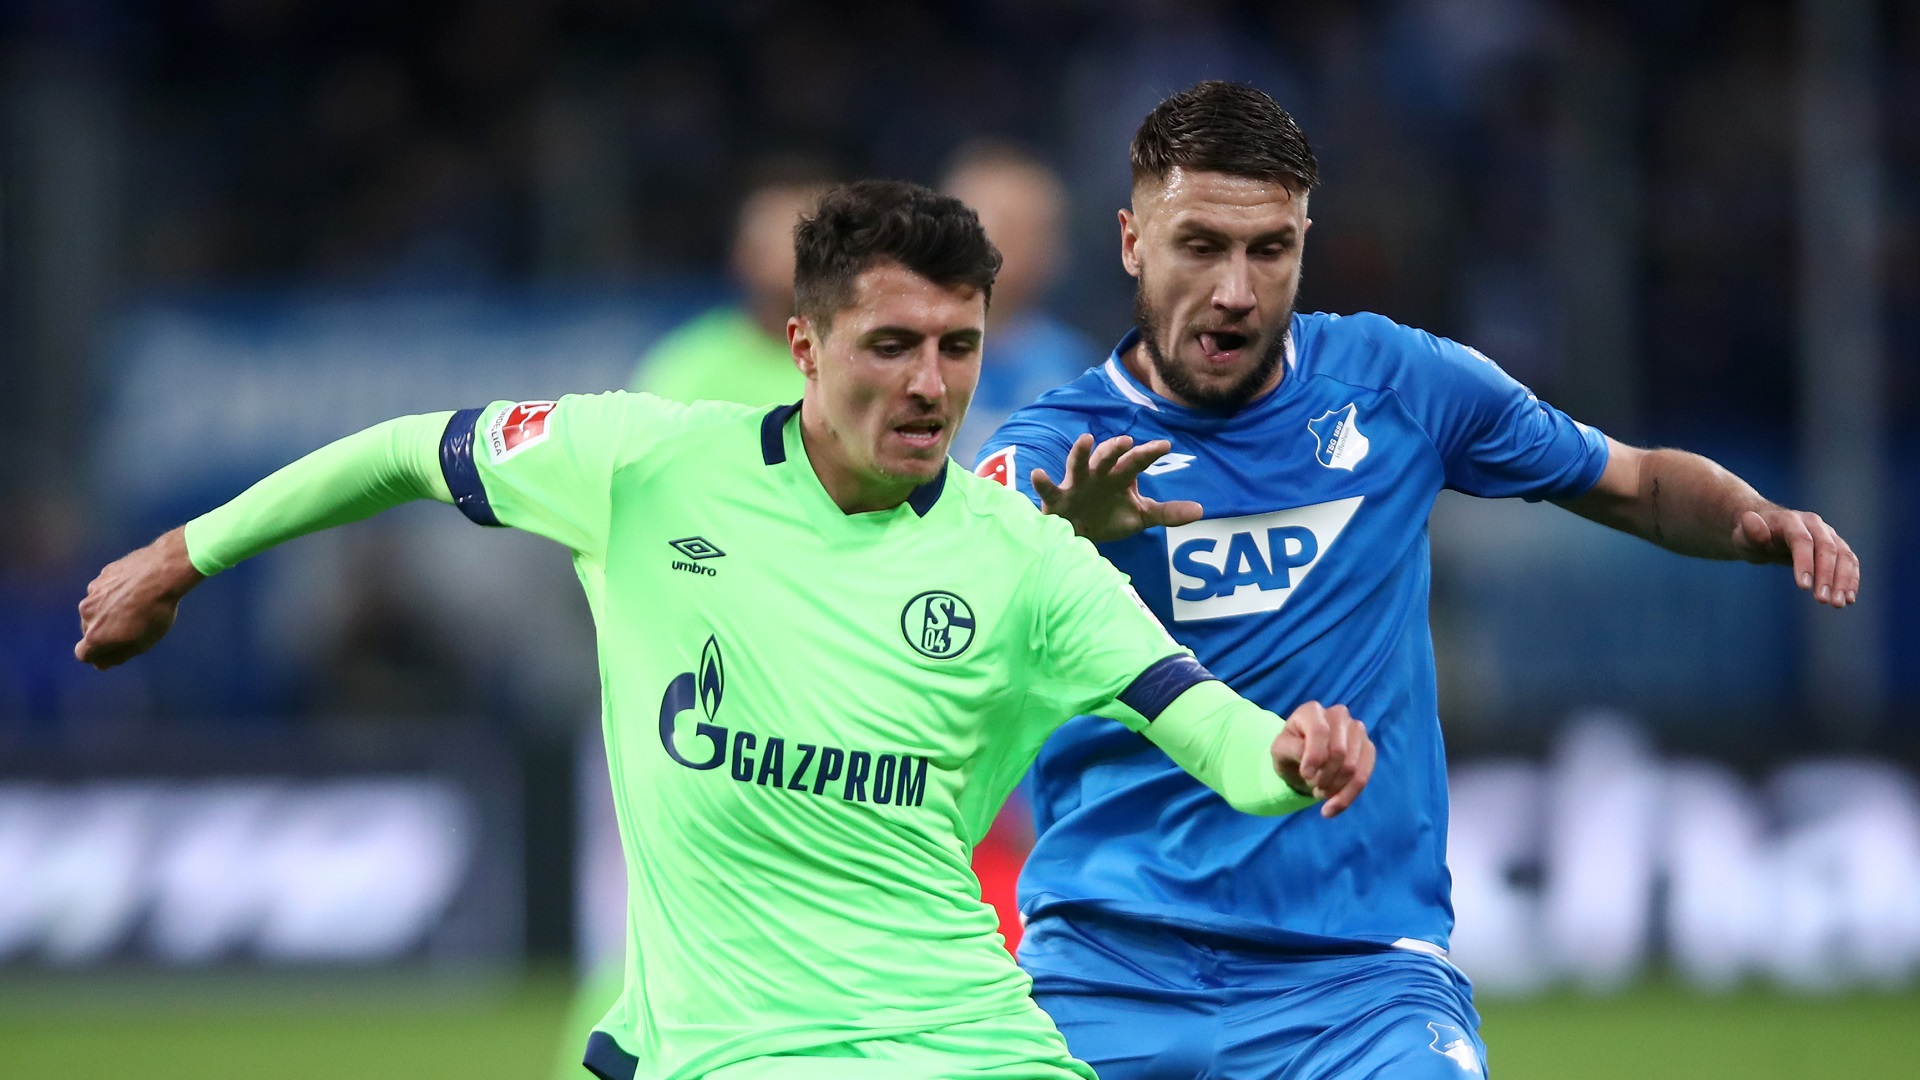 Schalke Vs Hoffenheim Live Stream